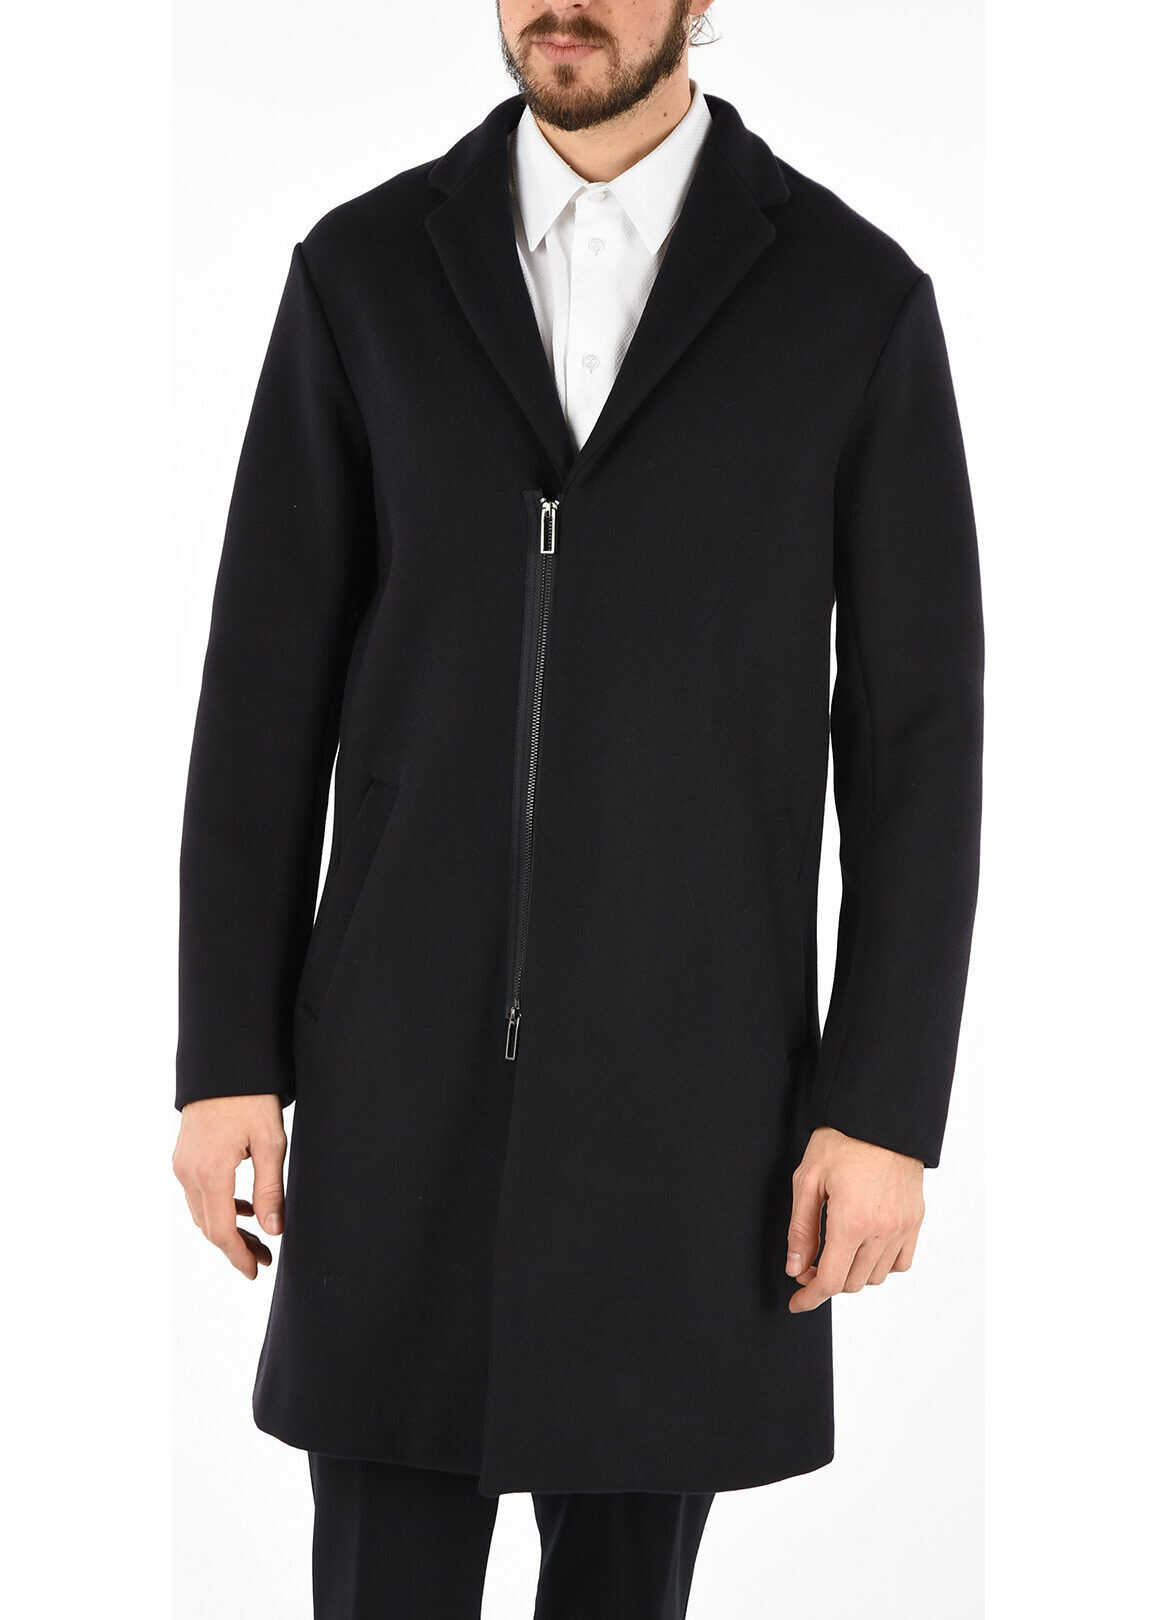 Armani EMPORIO Wool Zipped Coat BLUE